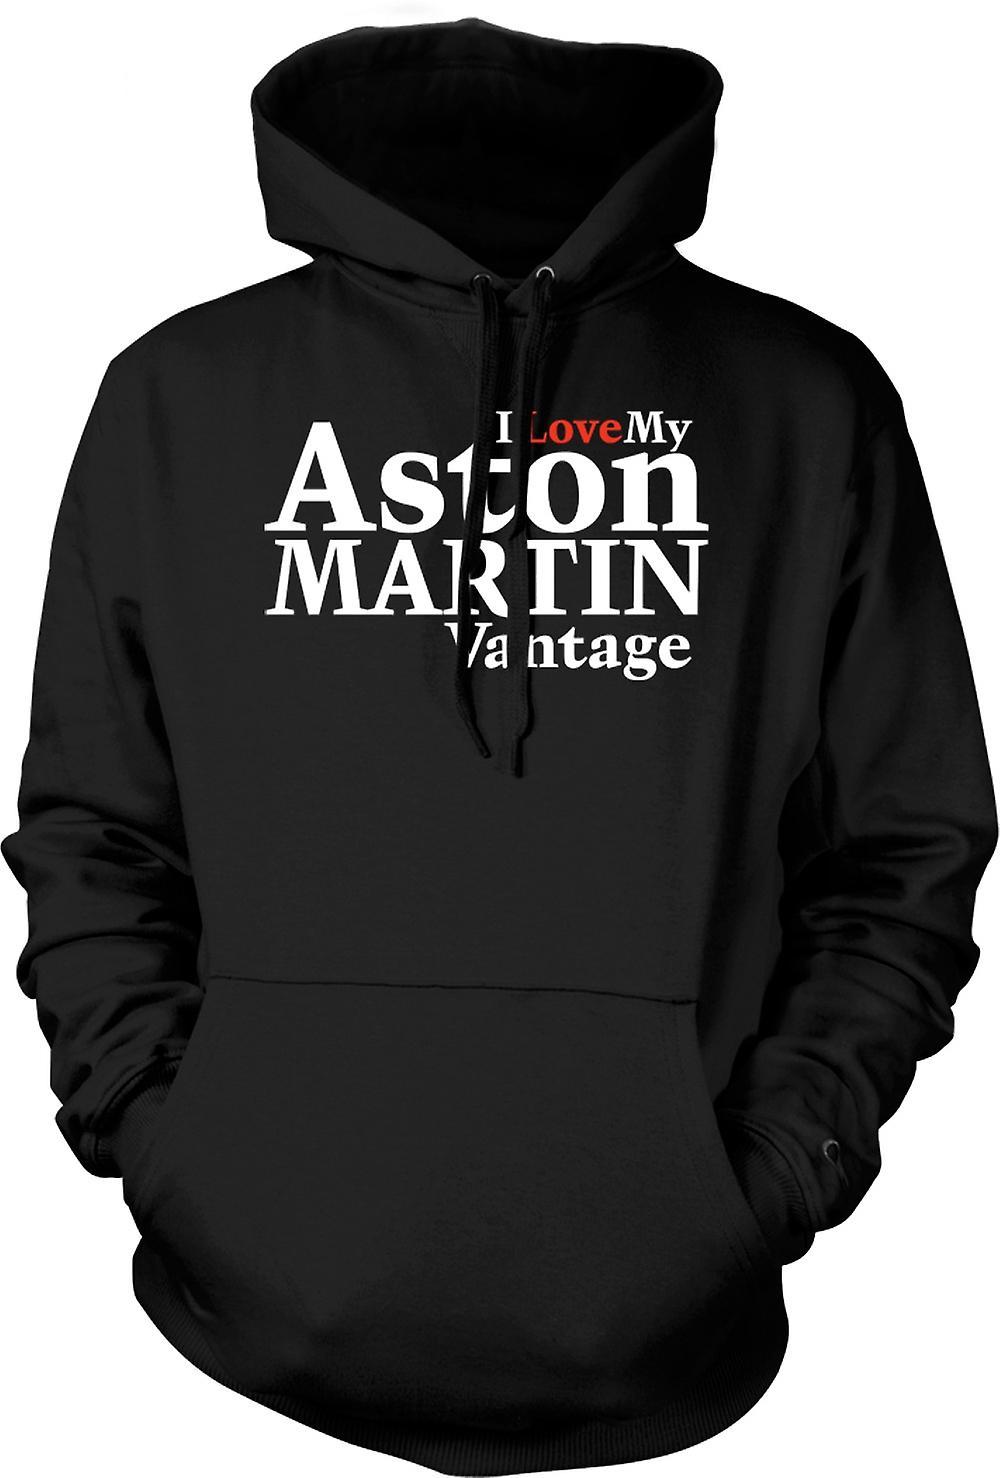 Mens Hoodie - I Love My Aston Martin Vantage - Car Enthusiast